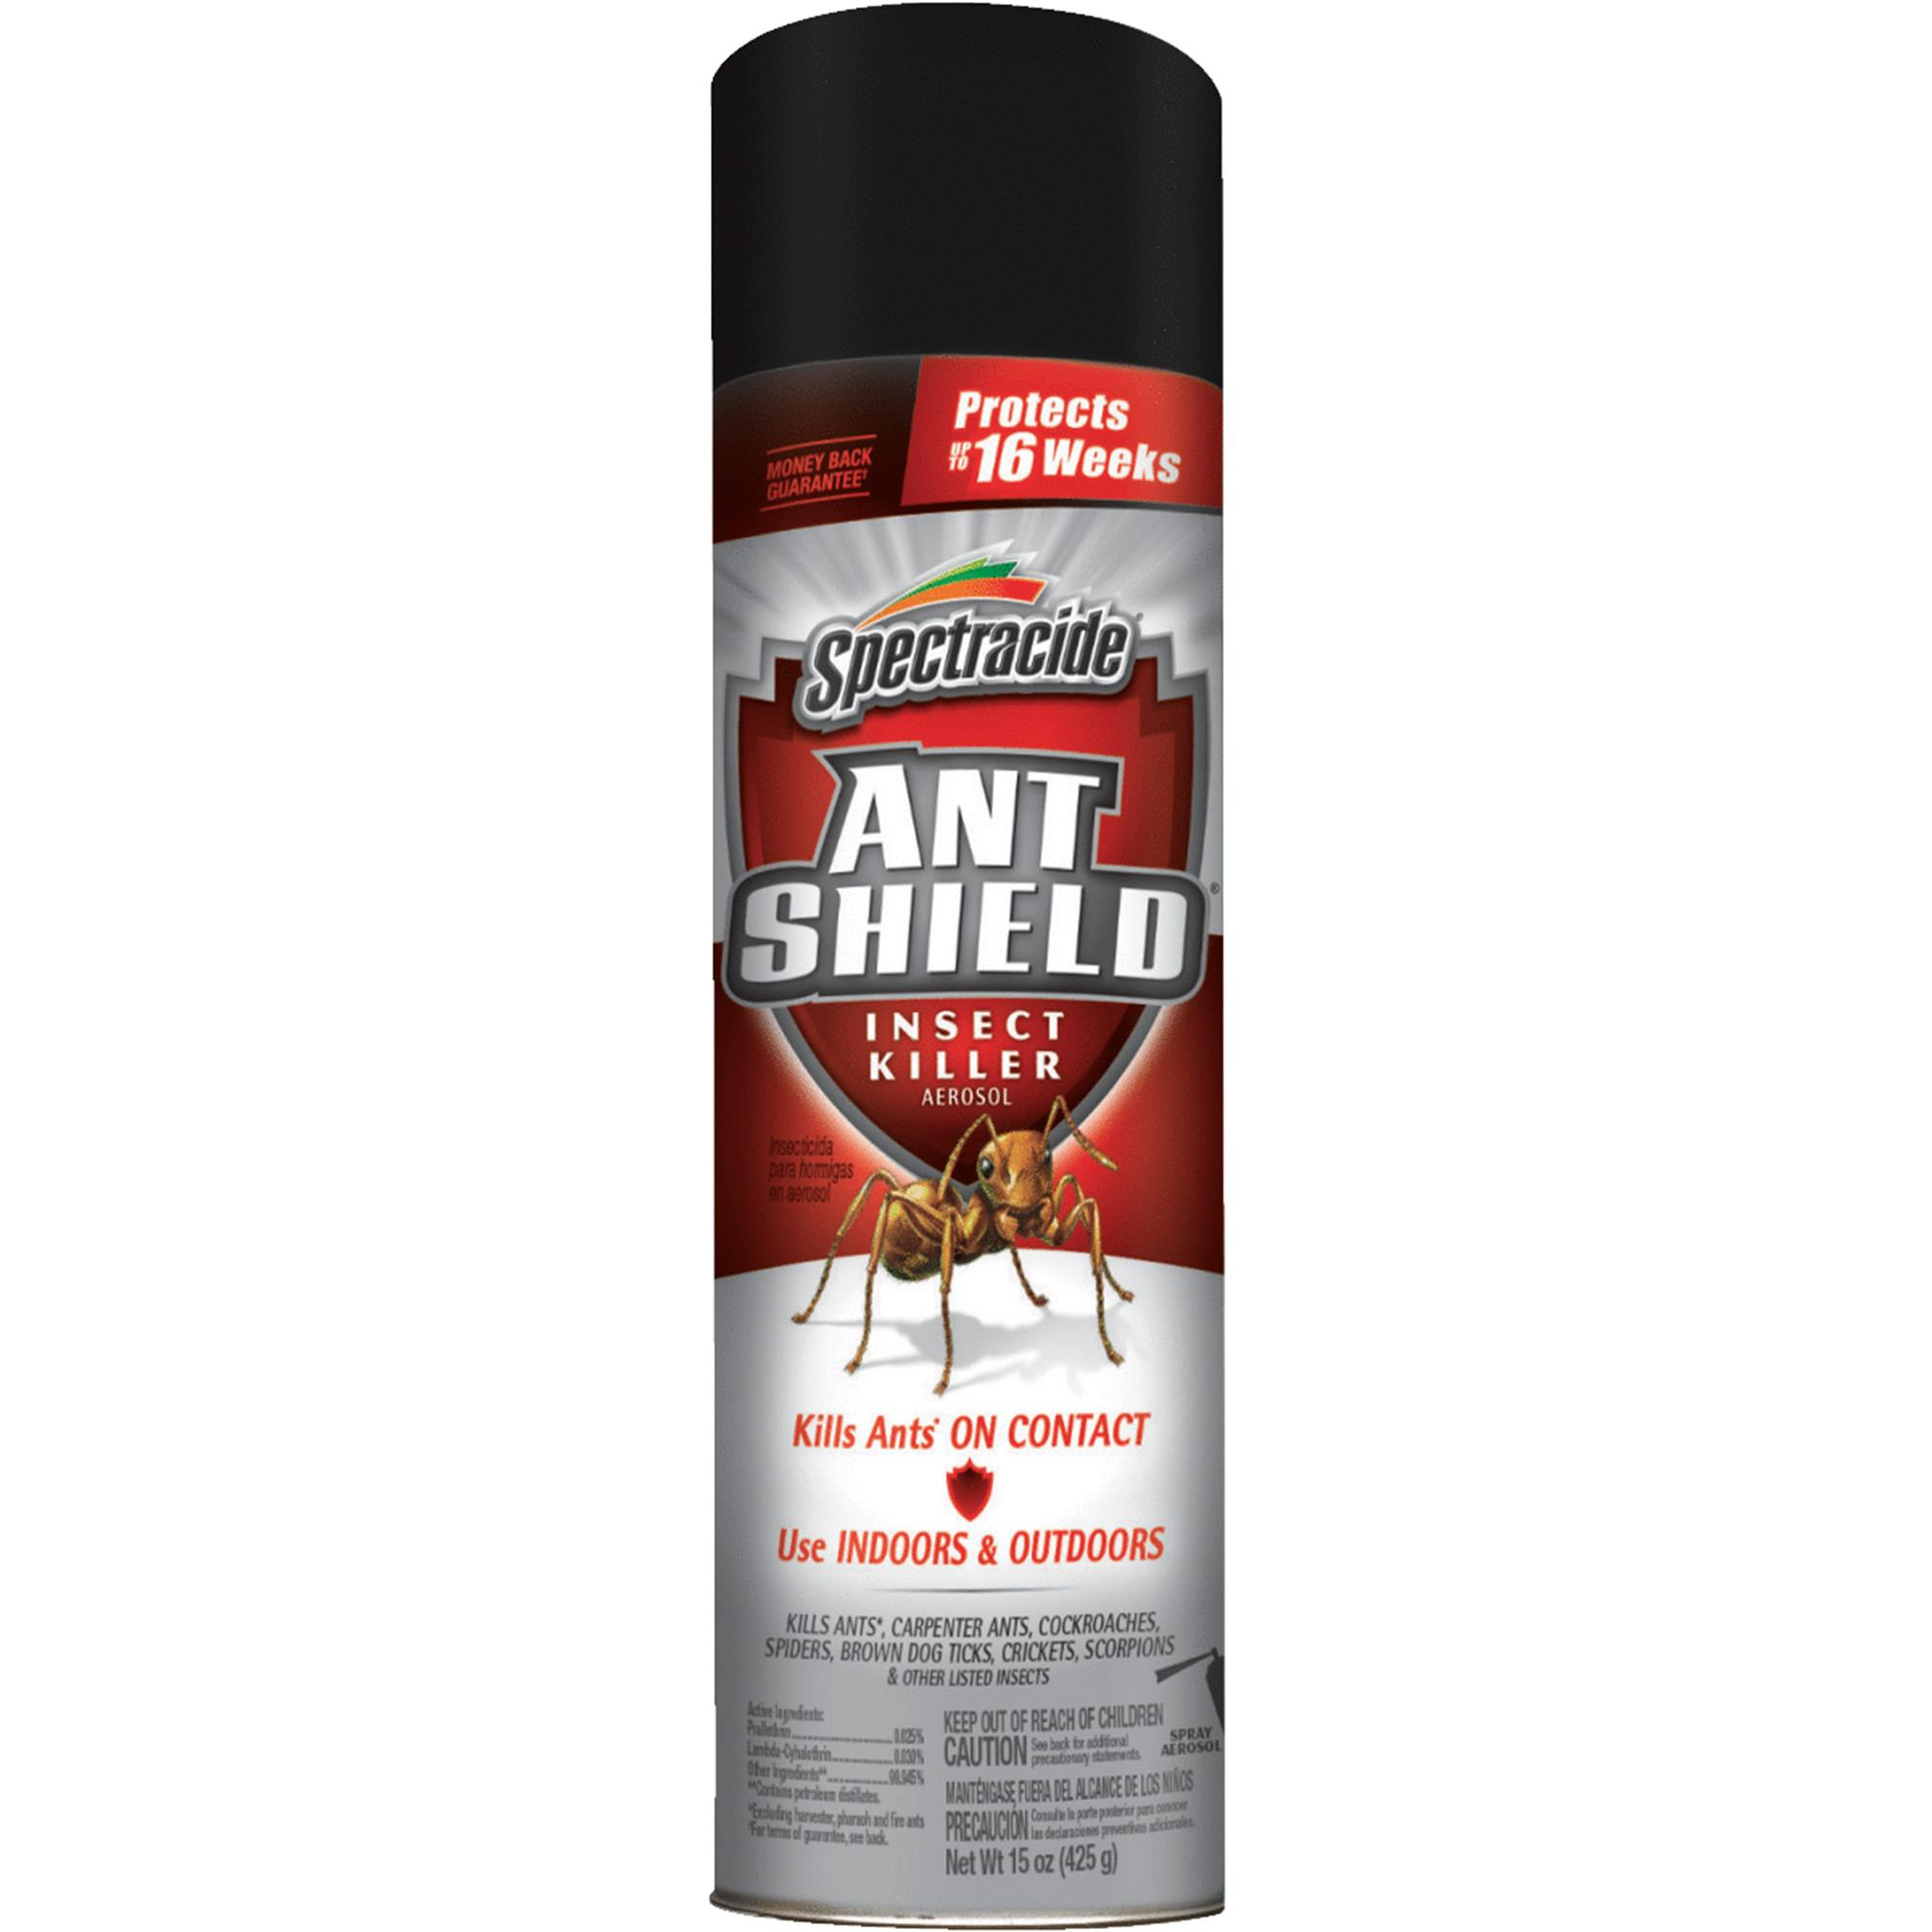 Spectracide Ant Shield Insect Killer Aerosol, 15-oz